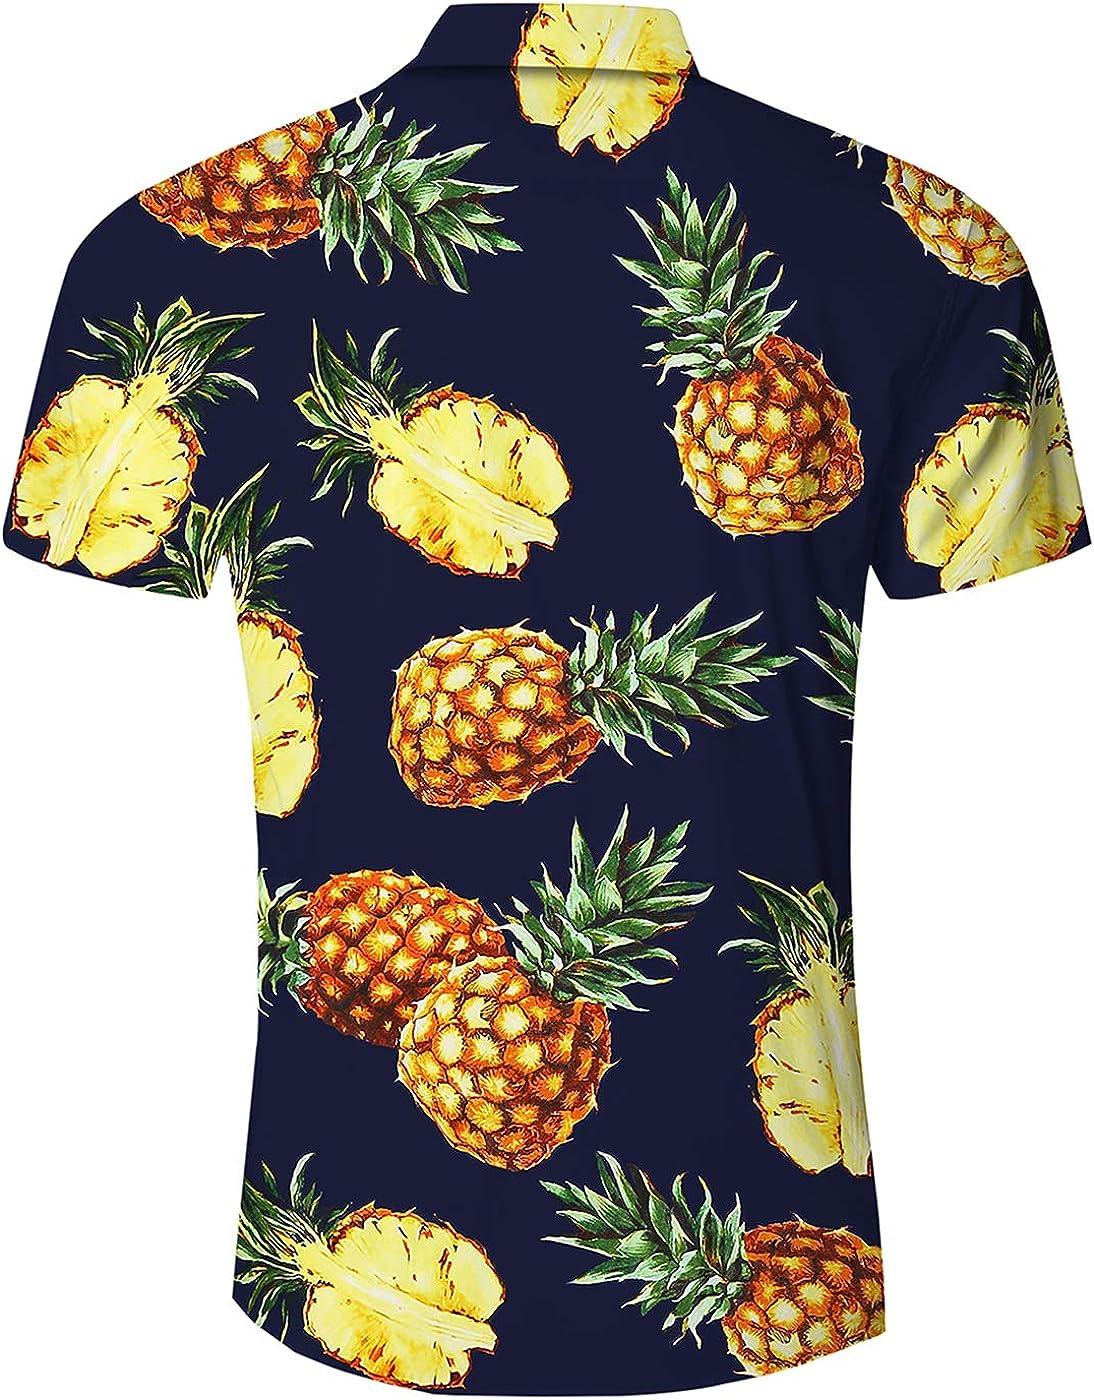 Loveternal Camicia Hawaiana Uomo Funky 3D Stampa Manica Corta Casual Shirt M-XXL